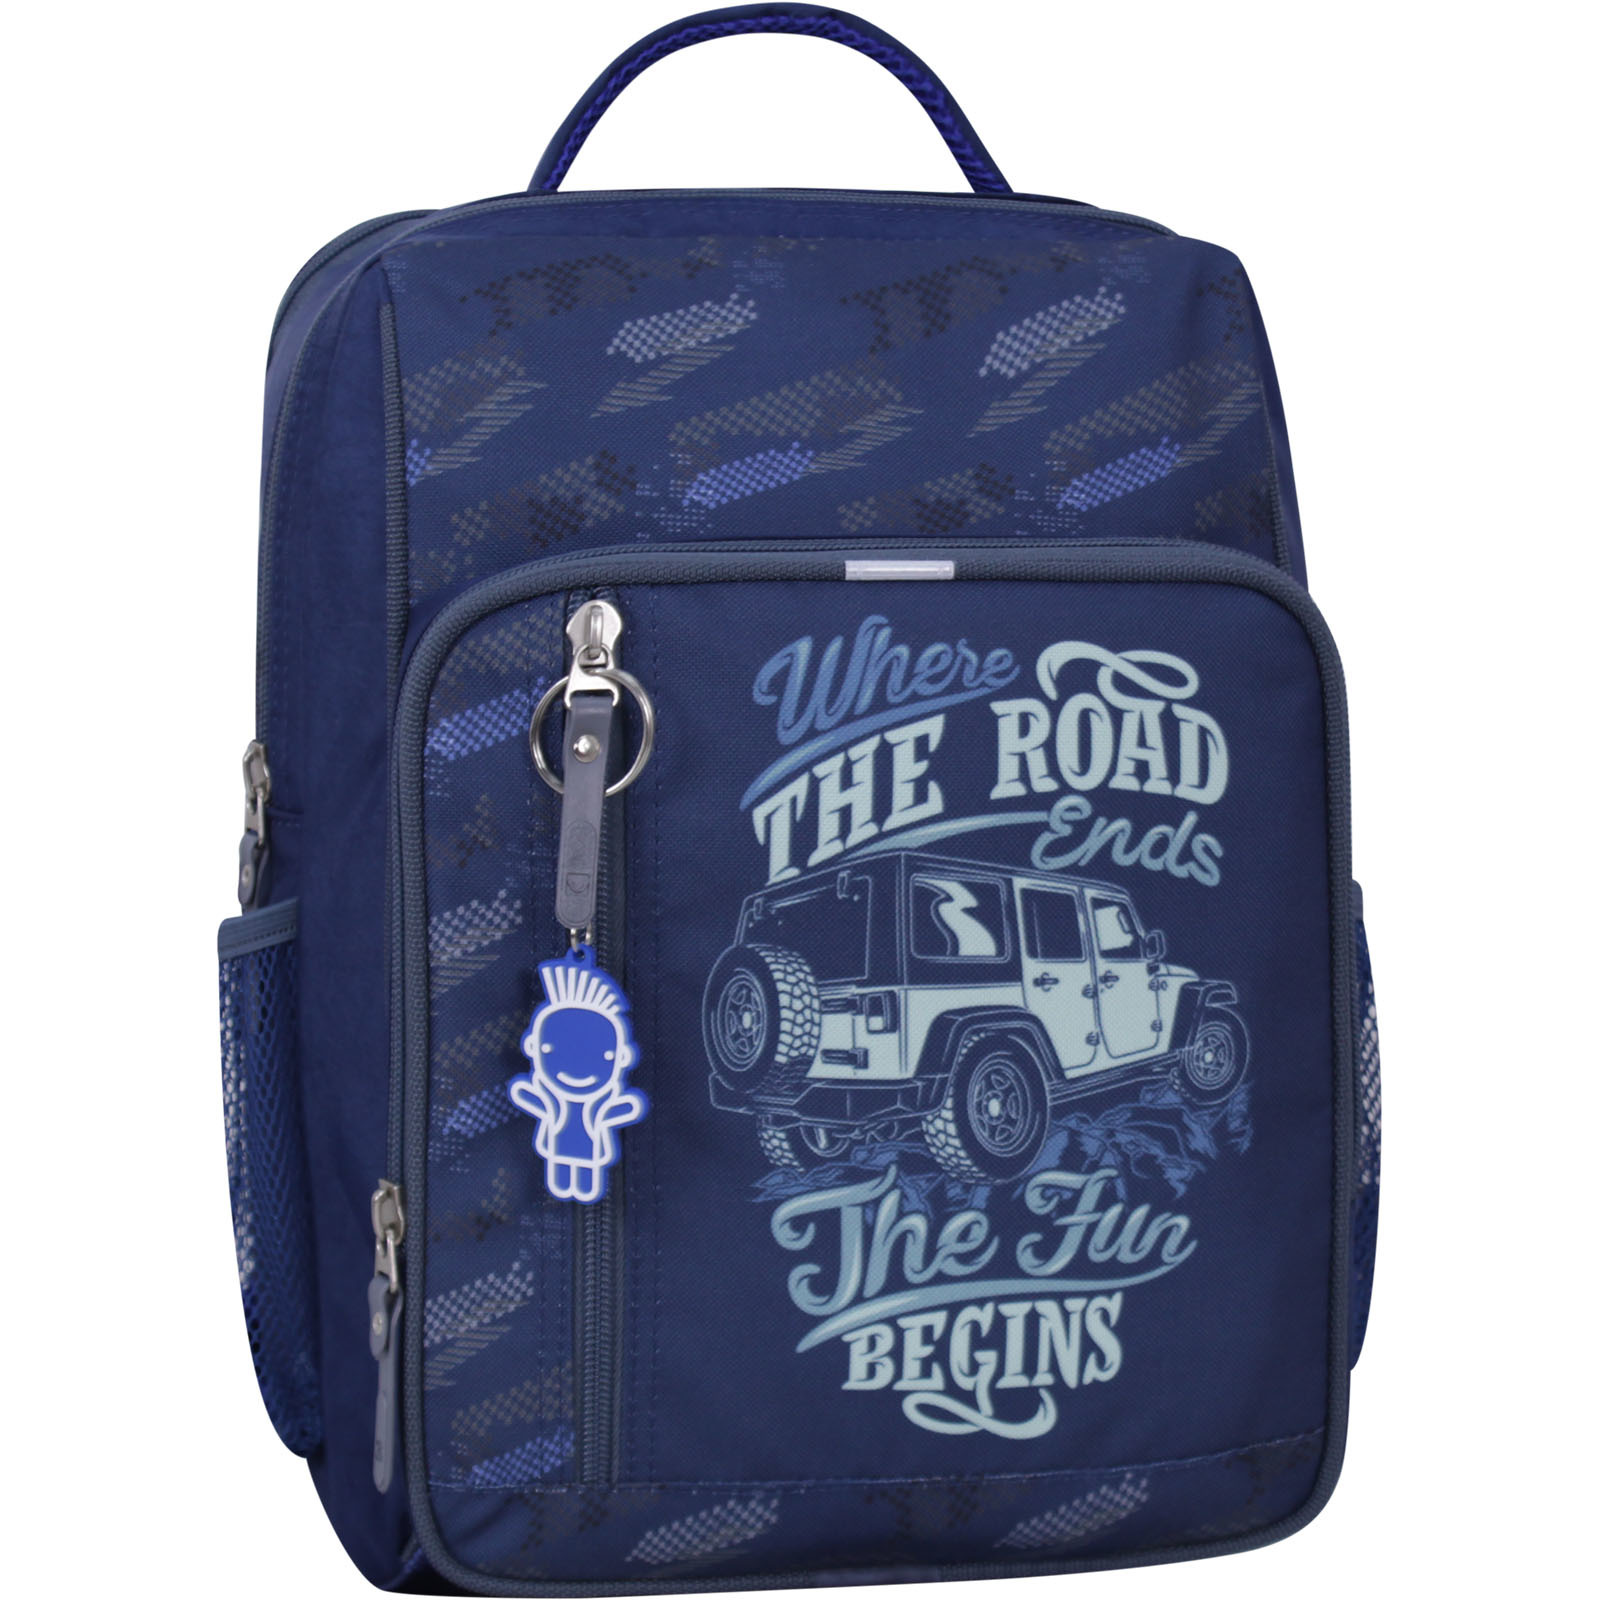 Школьные рюкзаки Рюкзак школьный Bagland Школьник 8 л. синий 909 (0012870) IMG_0533_суб909_-1600.jpg